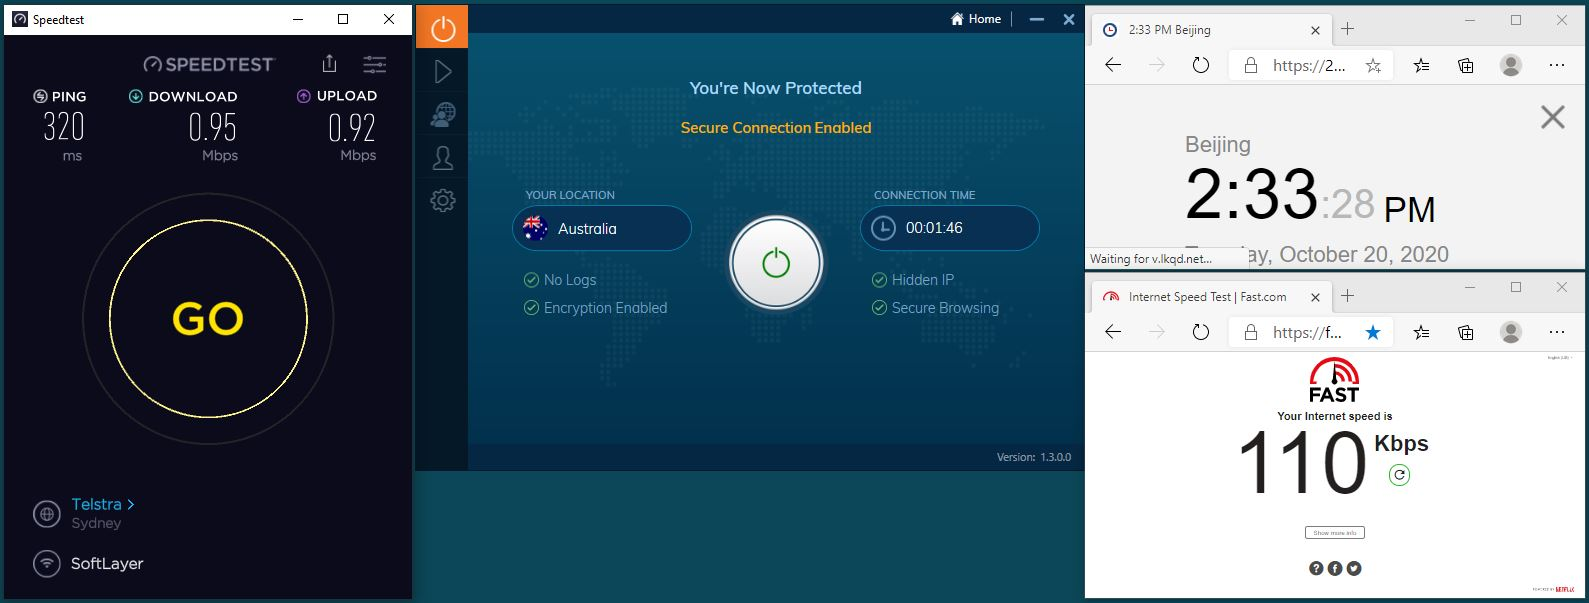 Windows10 IvacyVPN UDP+5555端口 Australia 服务器 中国VPN 翻墙 科学上网 翻墙速度测试 - 20201020